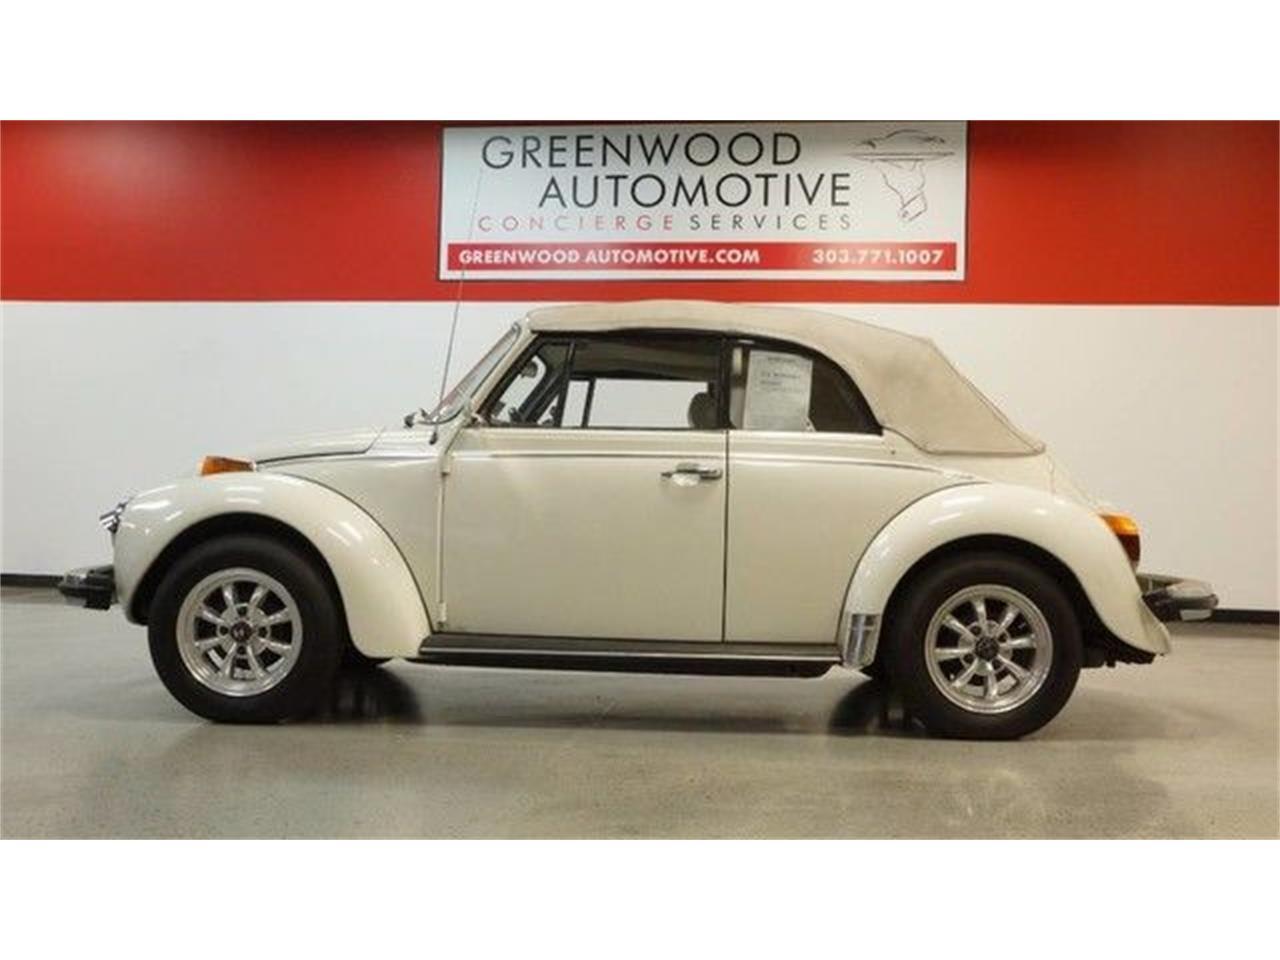 1979 Volkswagen Beetle (CC-1205590) for sale in Greenwood Village, Colorado